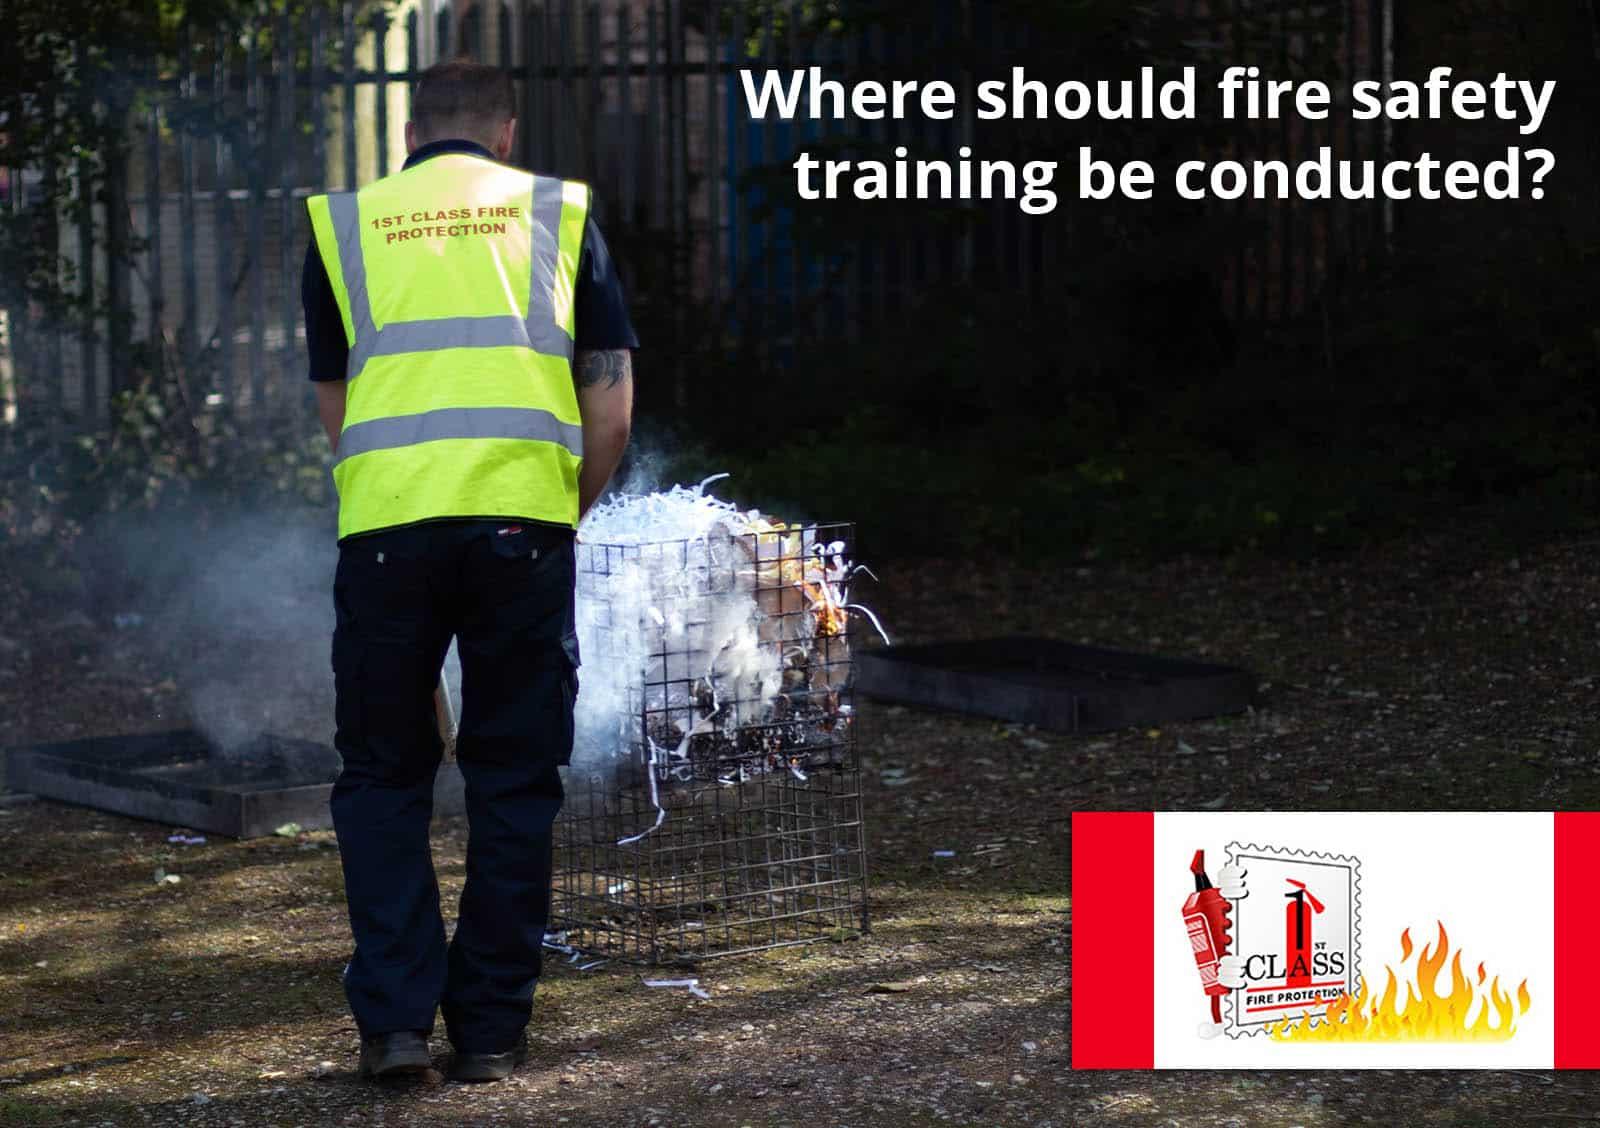 Fire Training on Premises